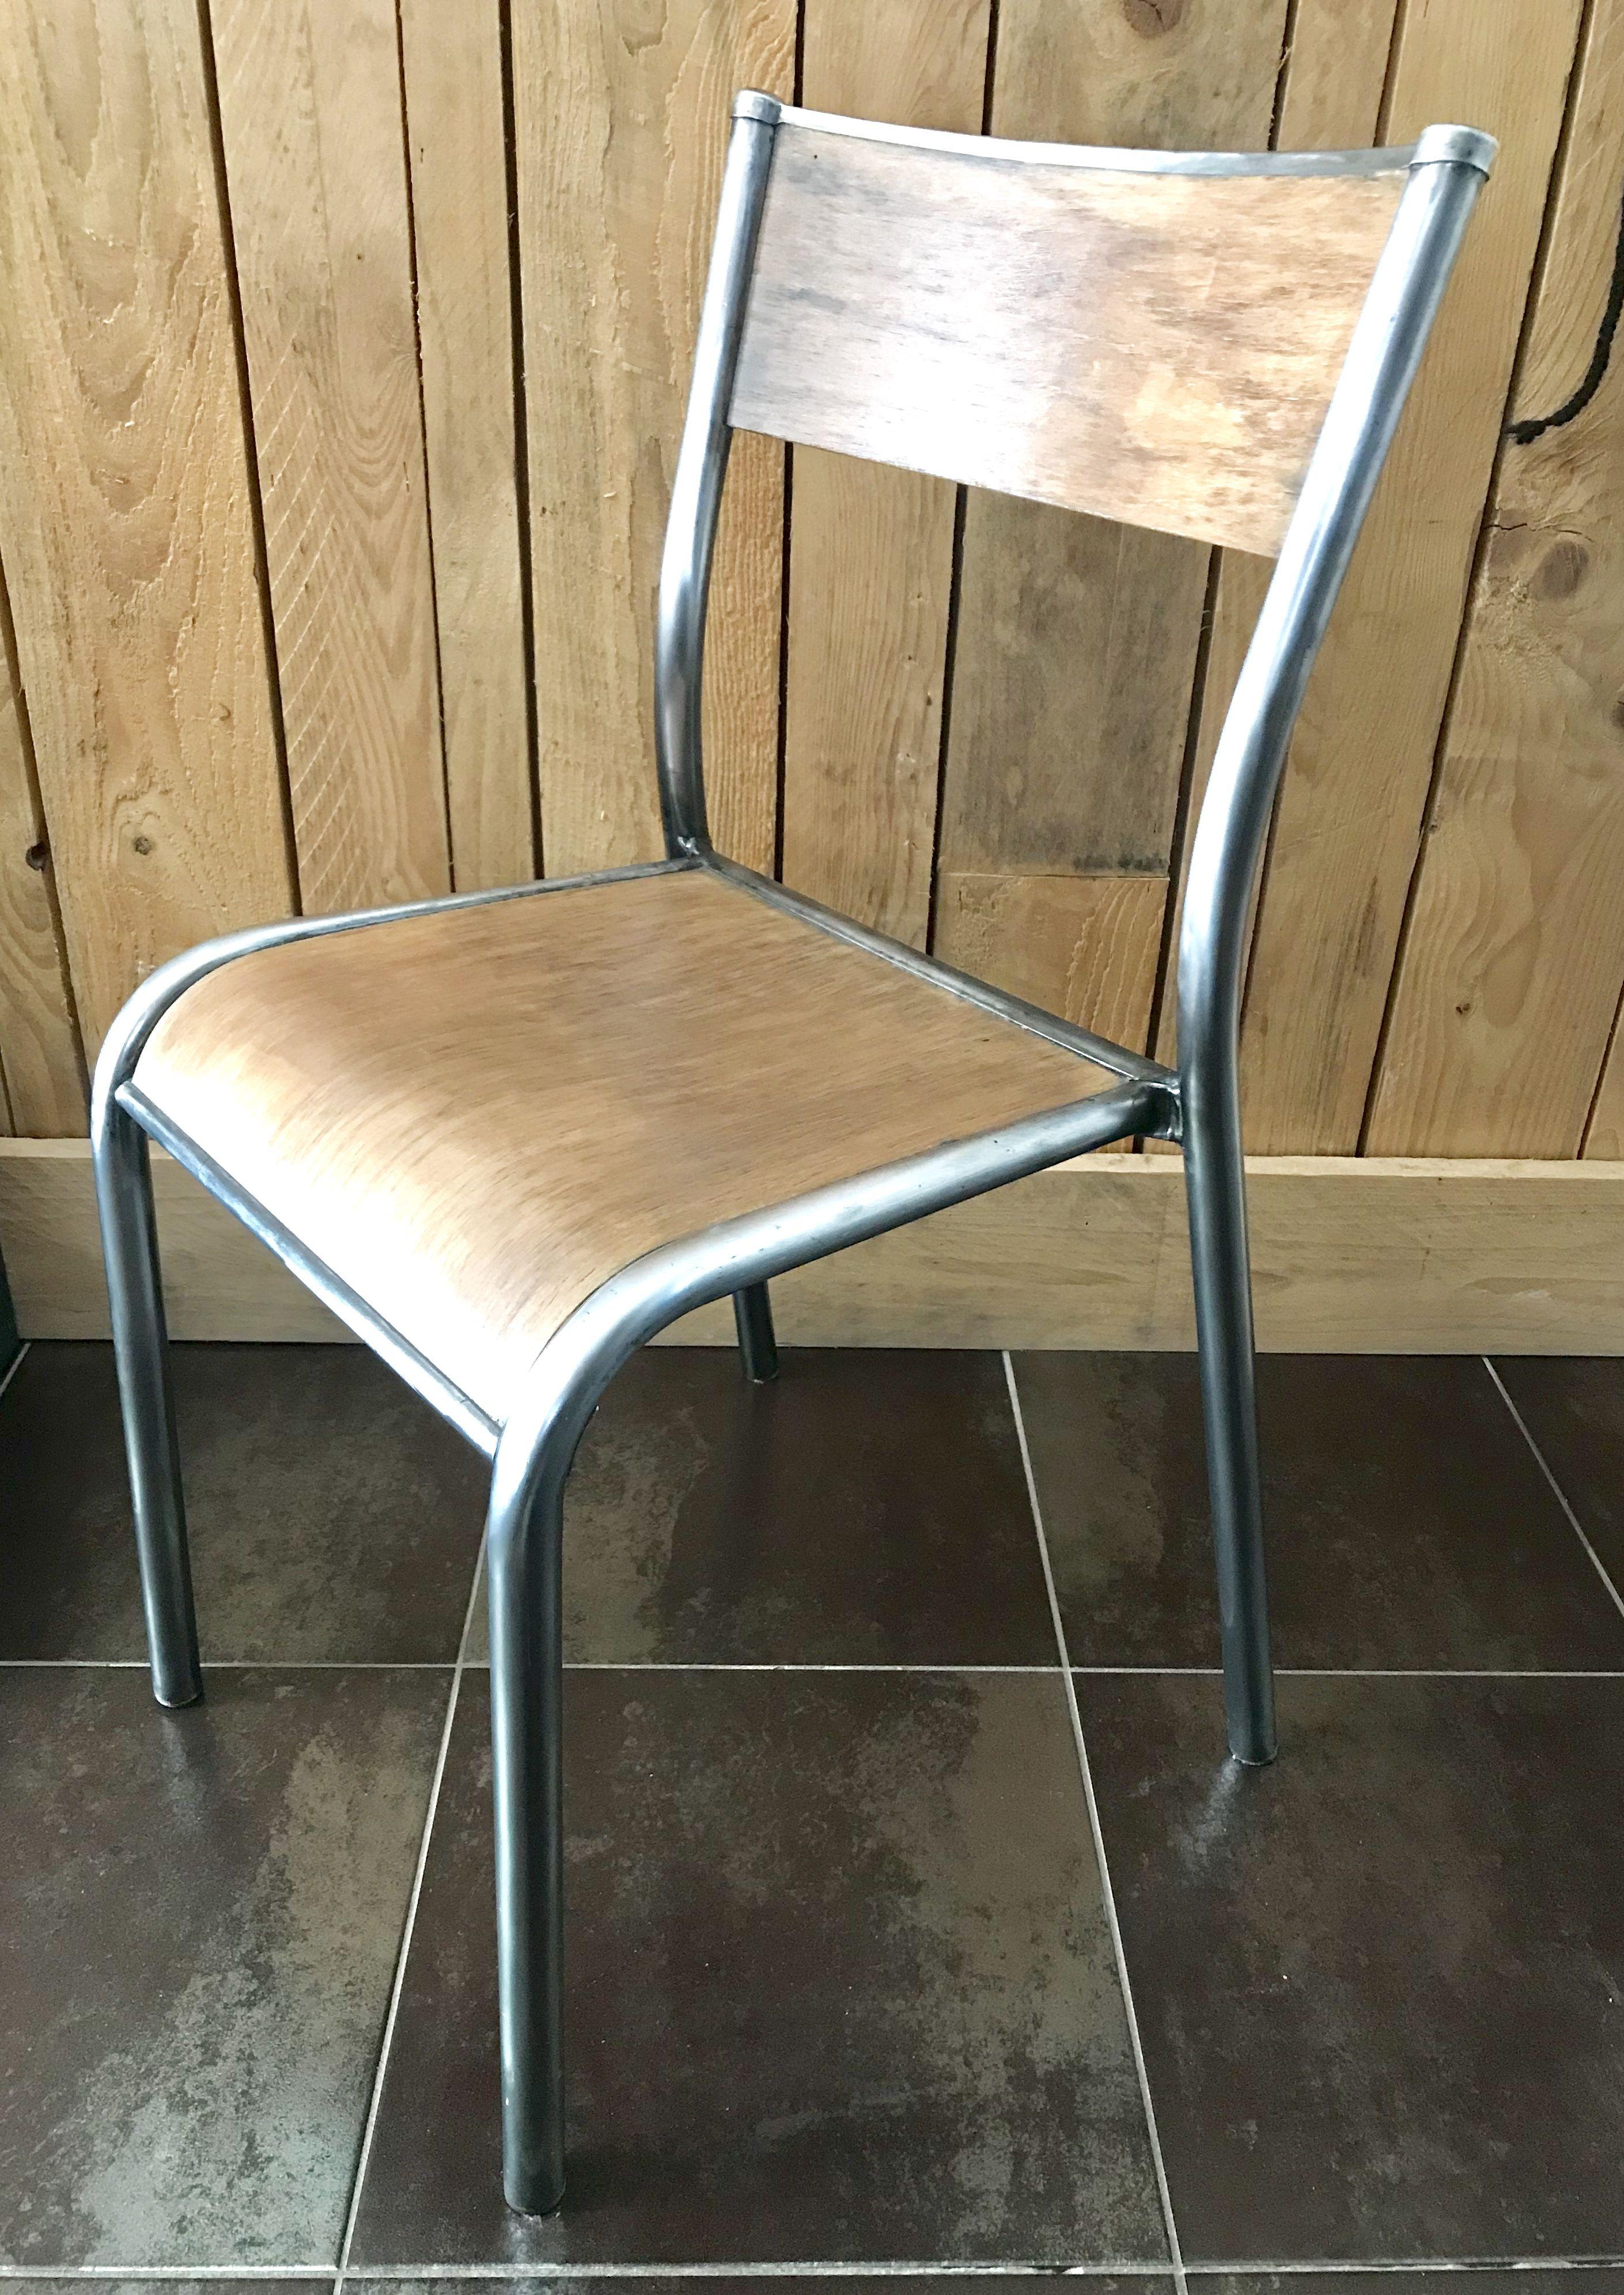 Chaise D École Mullca chaise mullca | chaise, salon